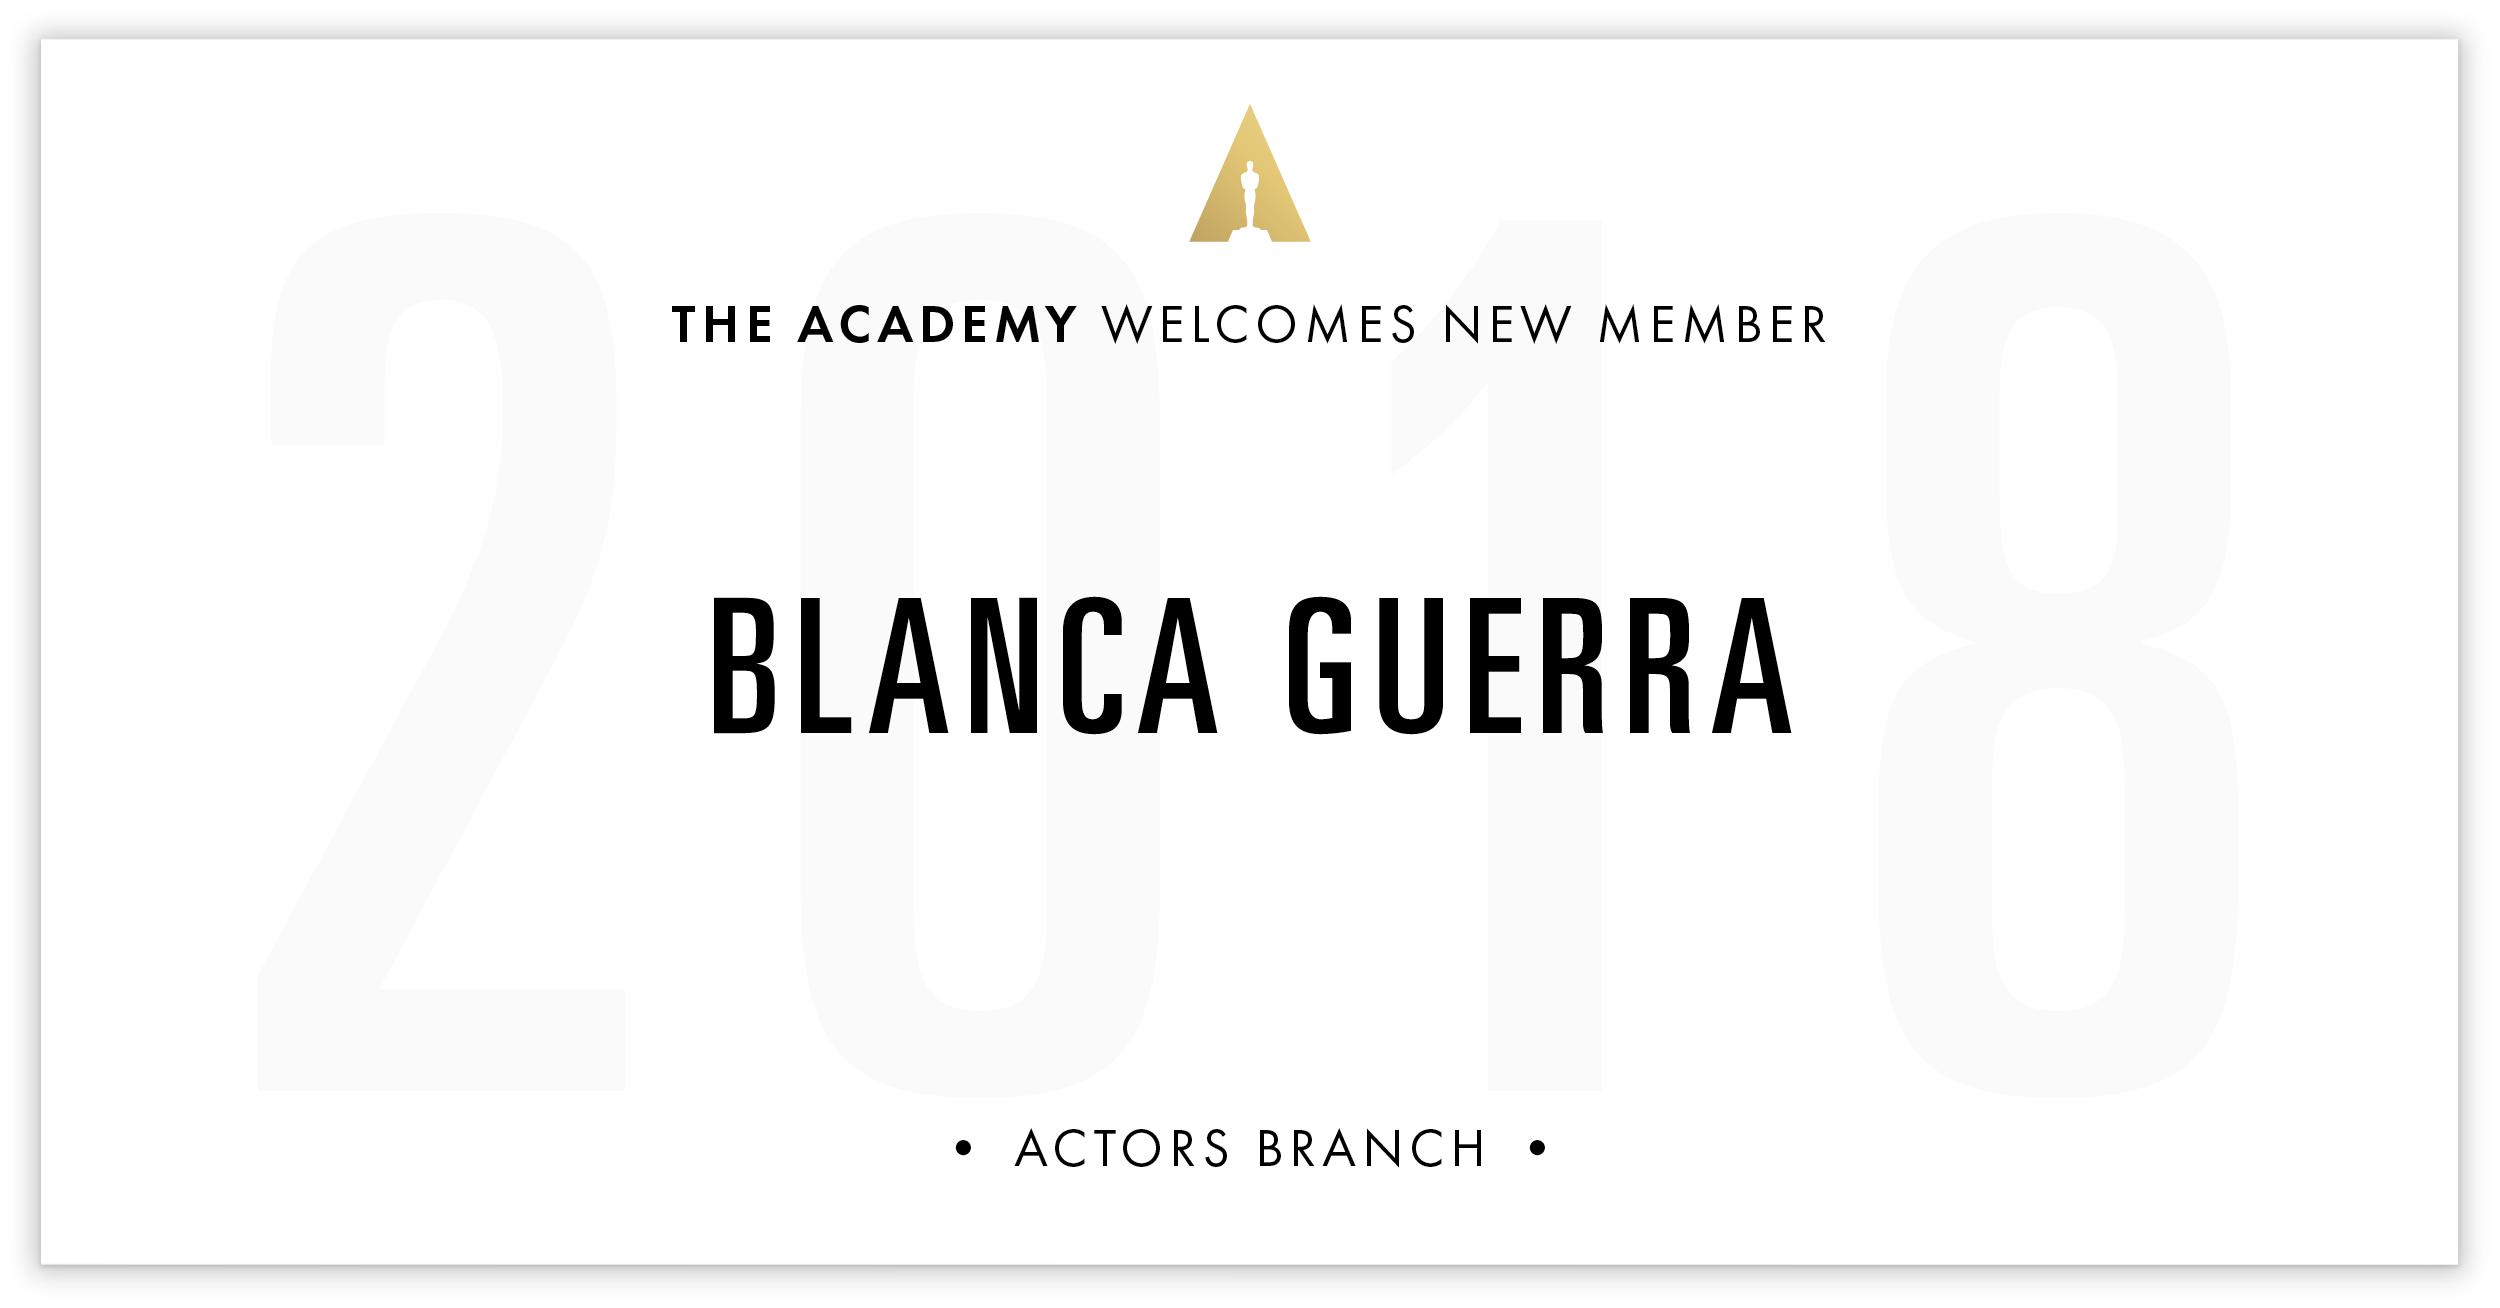 Blanca Guerra is invited!